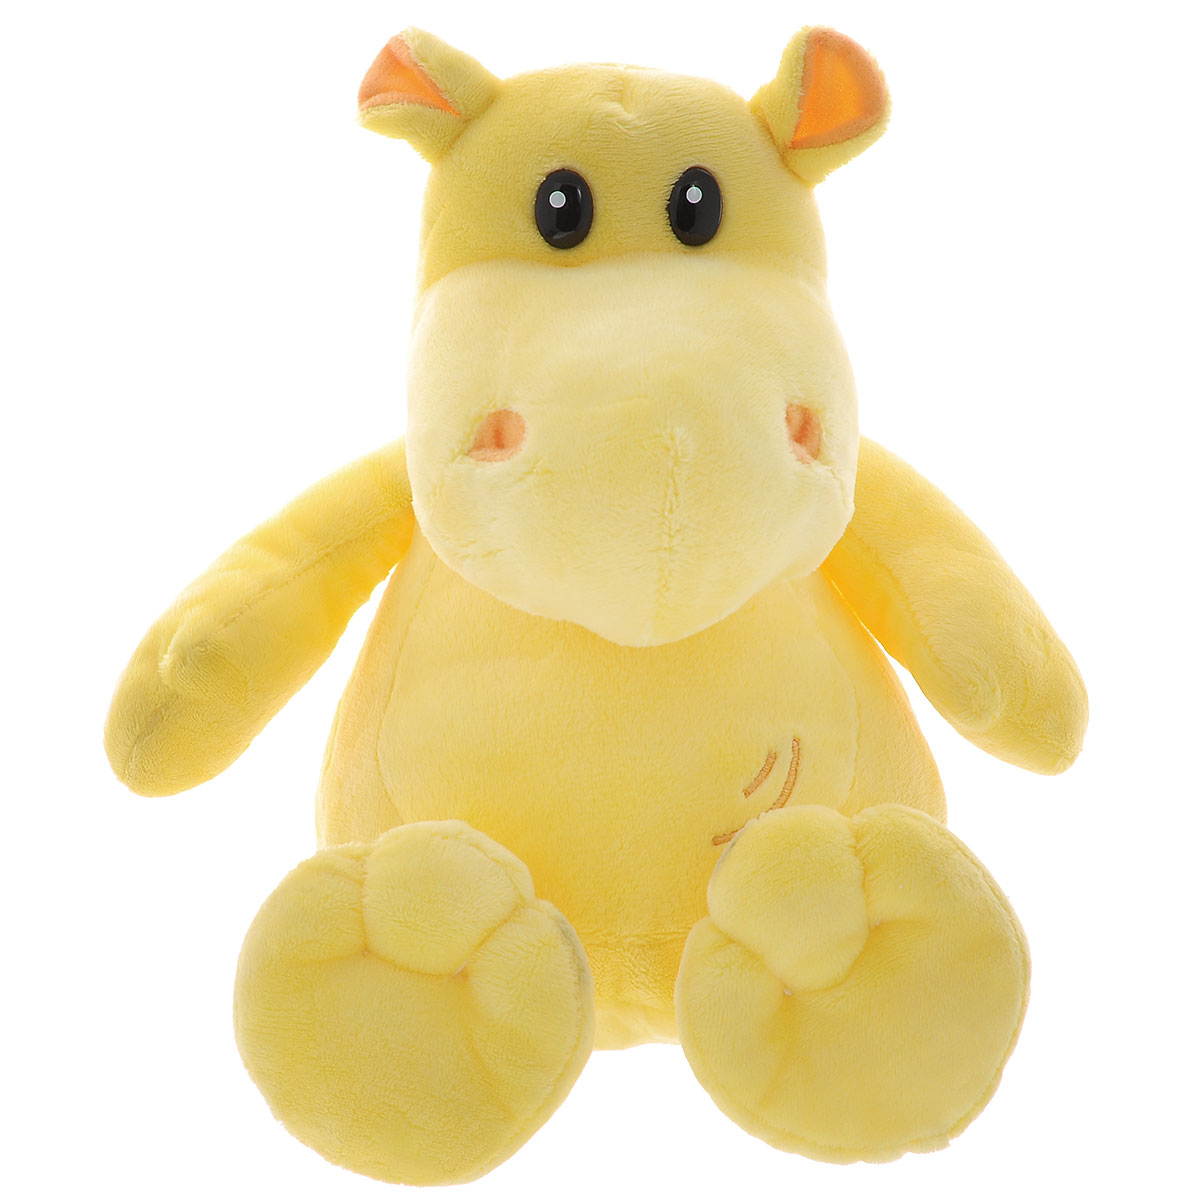 Мягкая игрушка Plush Apple Бегемот, цвет: желтый, 27 см plush apple 27